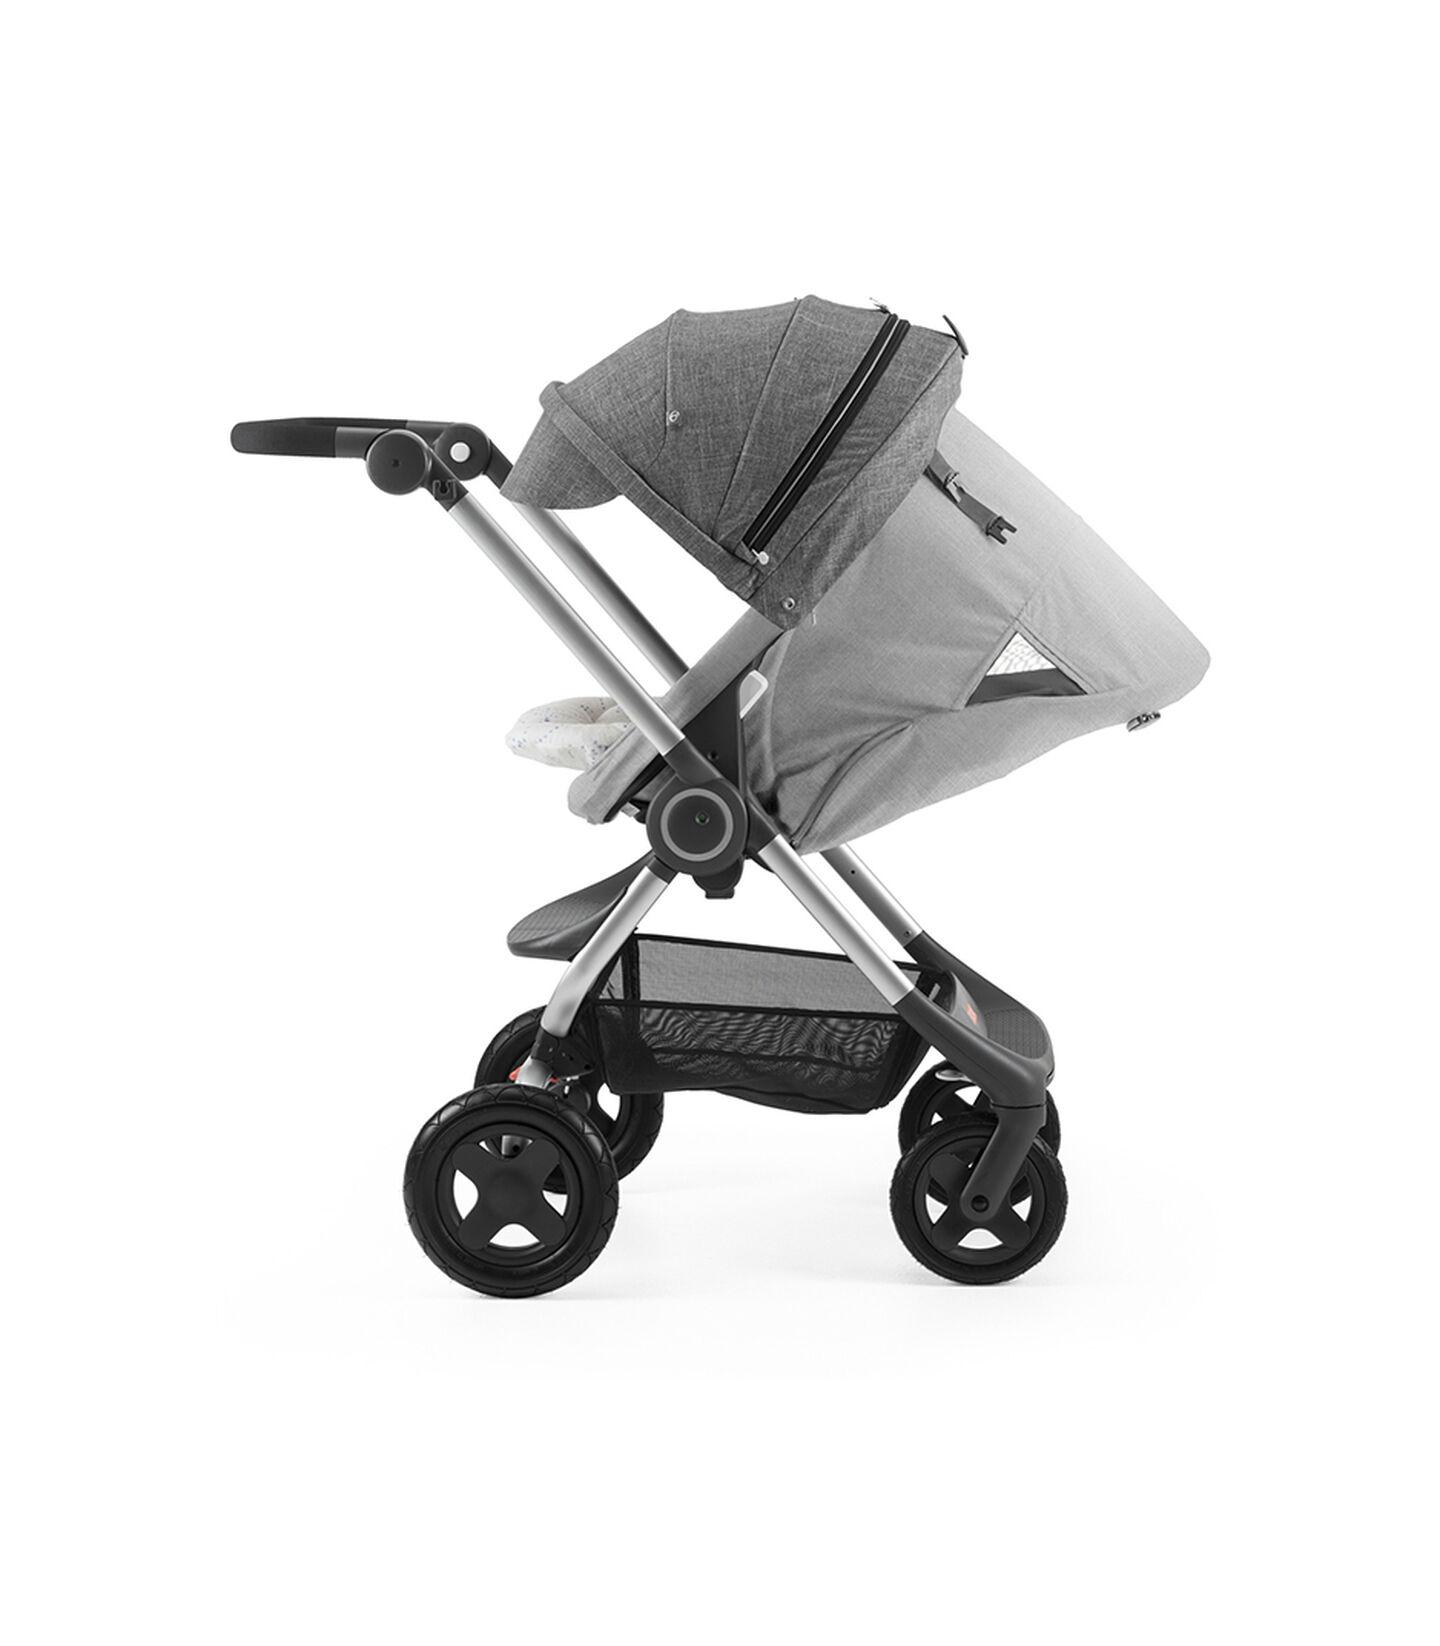 Stokke® Scoot™ with Grey Melange seat and Black Melange Canopy. Parent Facing. Sleep position.